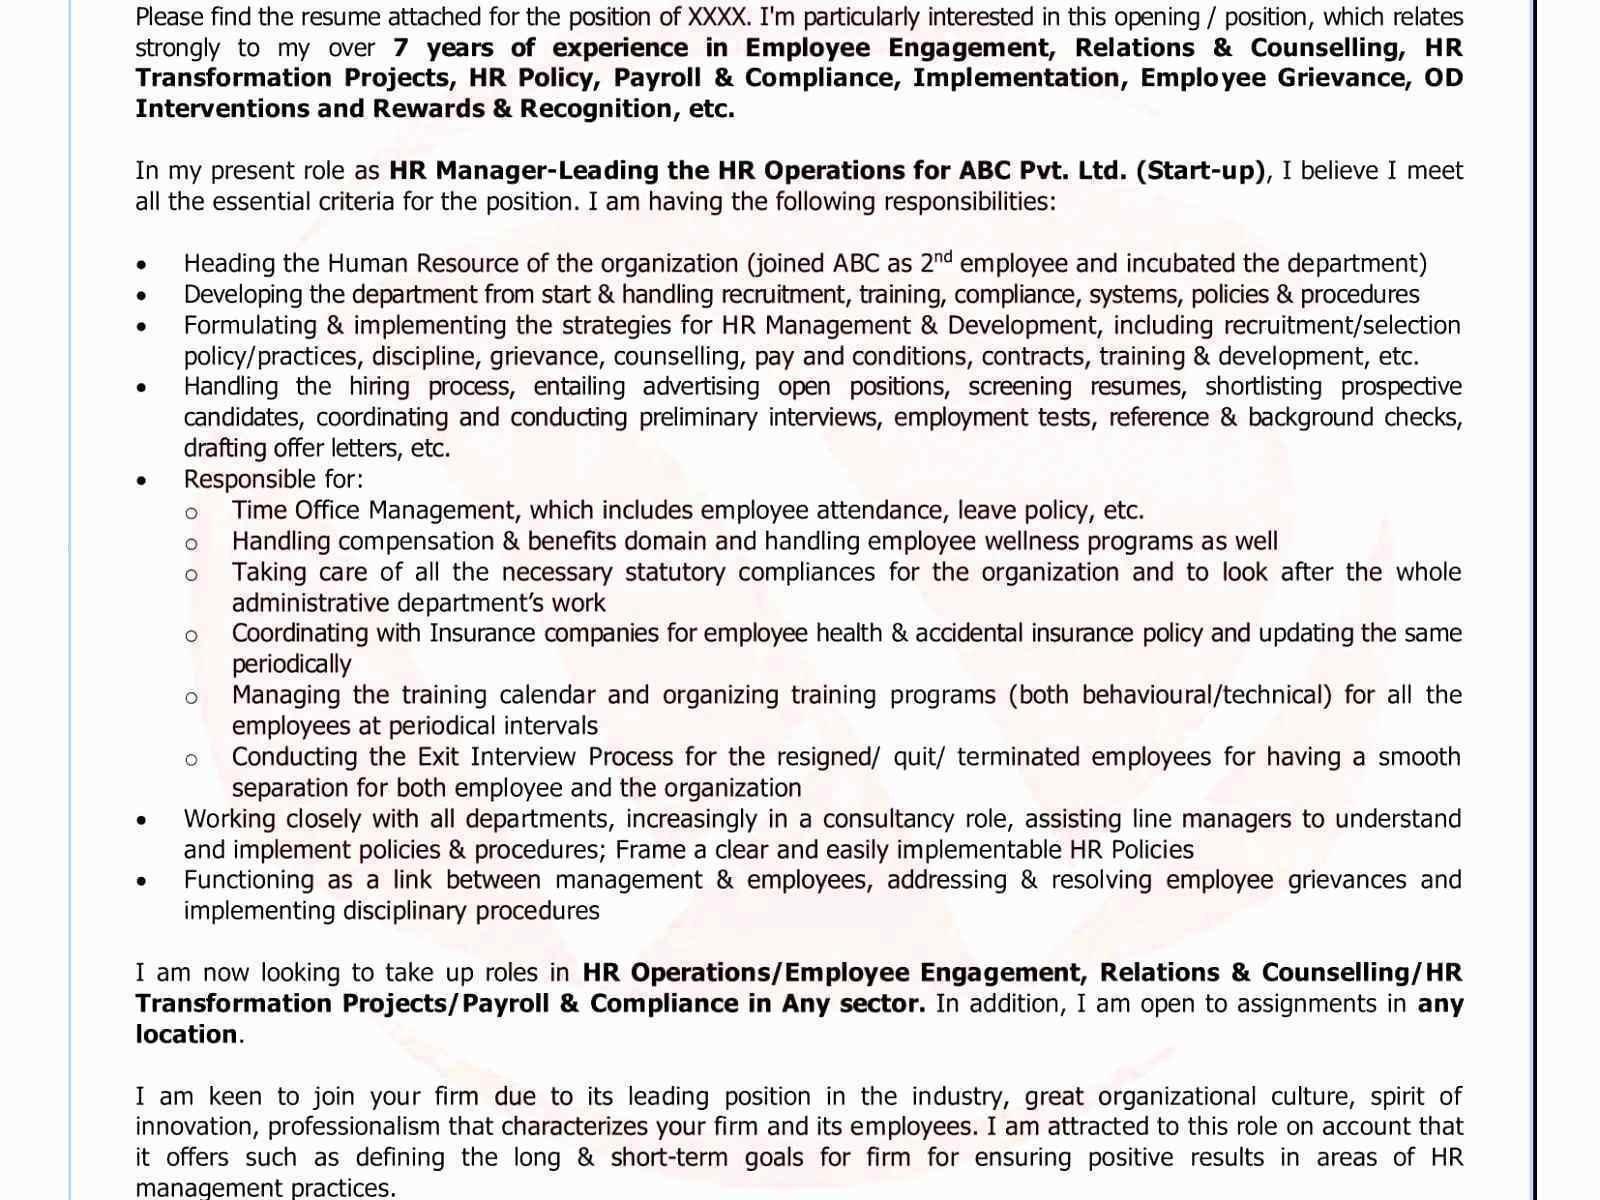 emt resume example examples emt resume examples fresh emt resume example new examples a resume of emt resume example